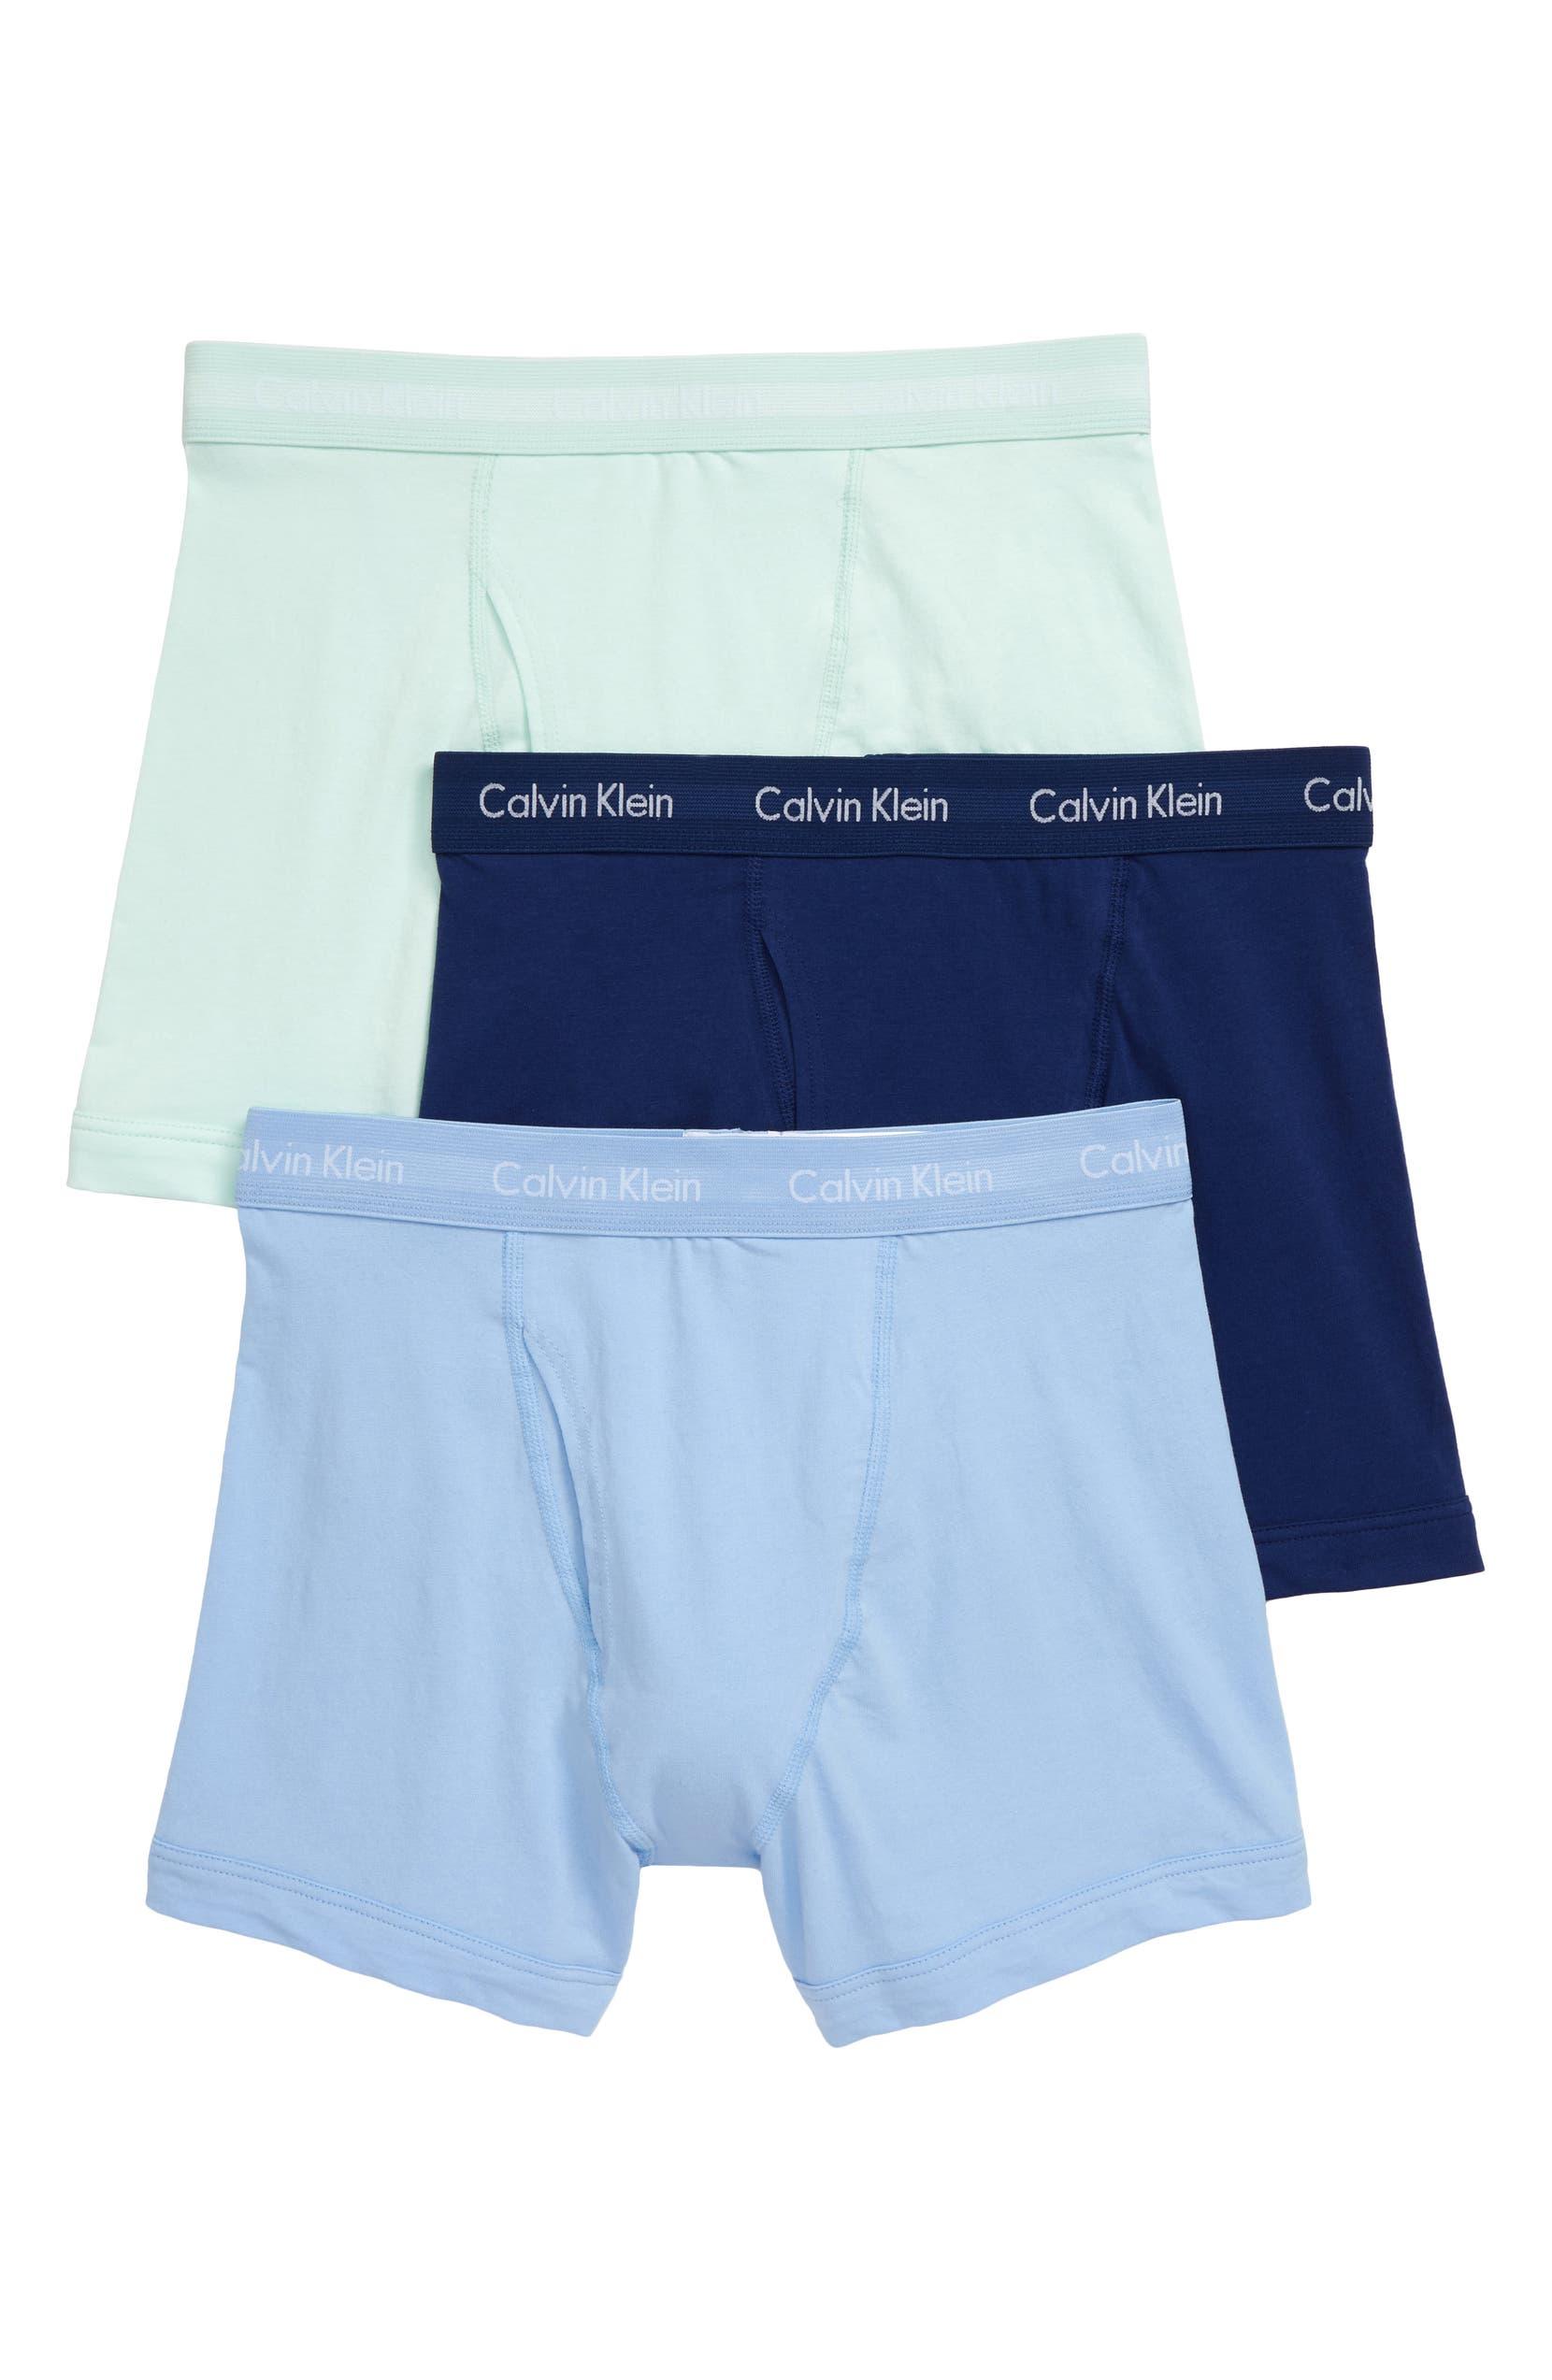 867149510a212a Calvin Klein 3-Pack Boxer Briefs | Nordstrom